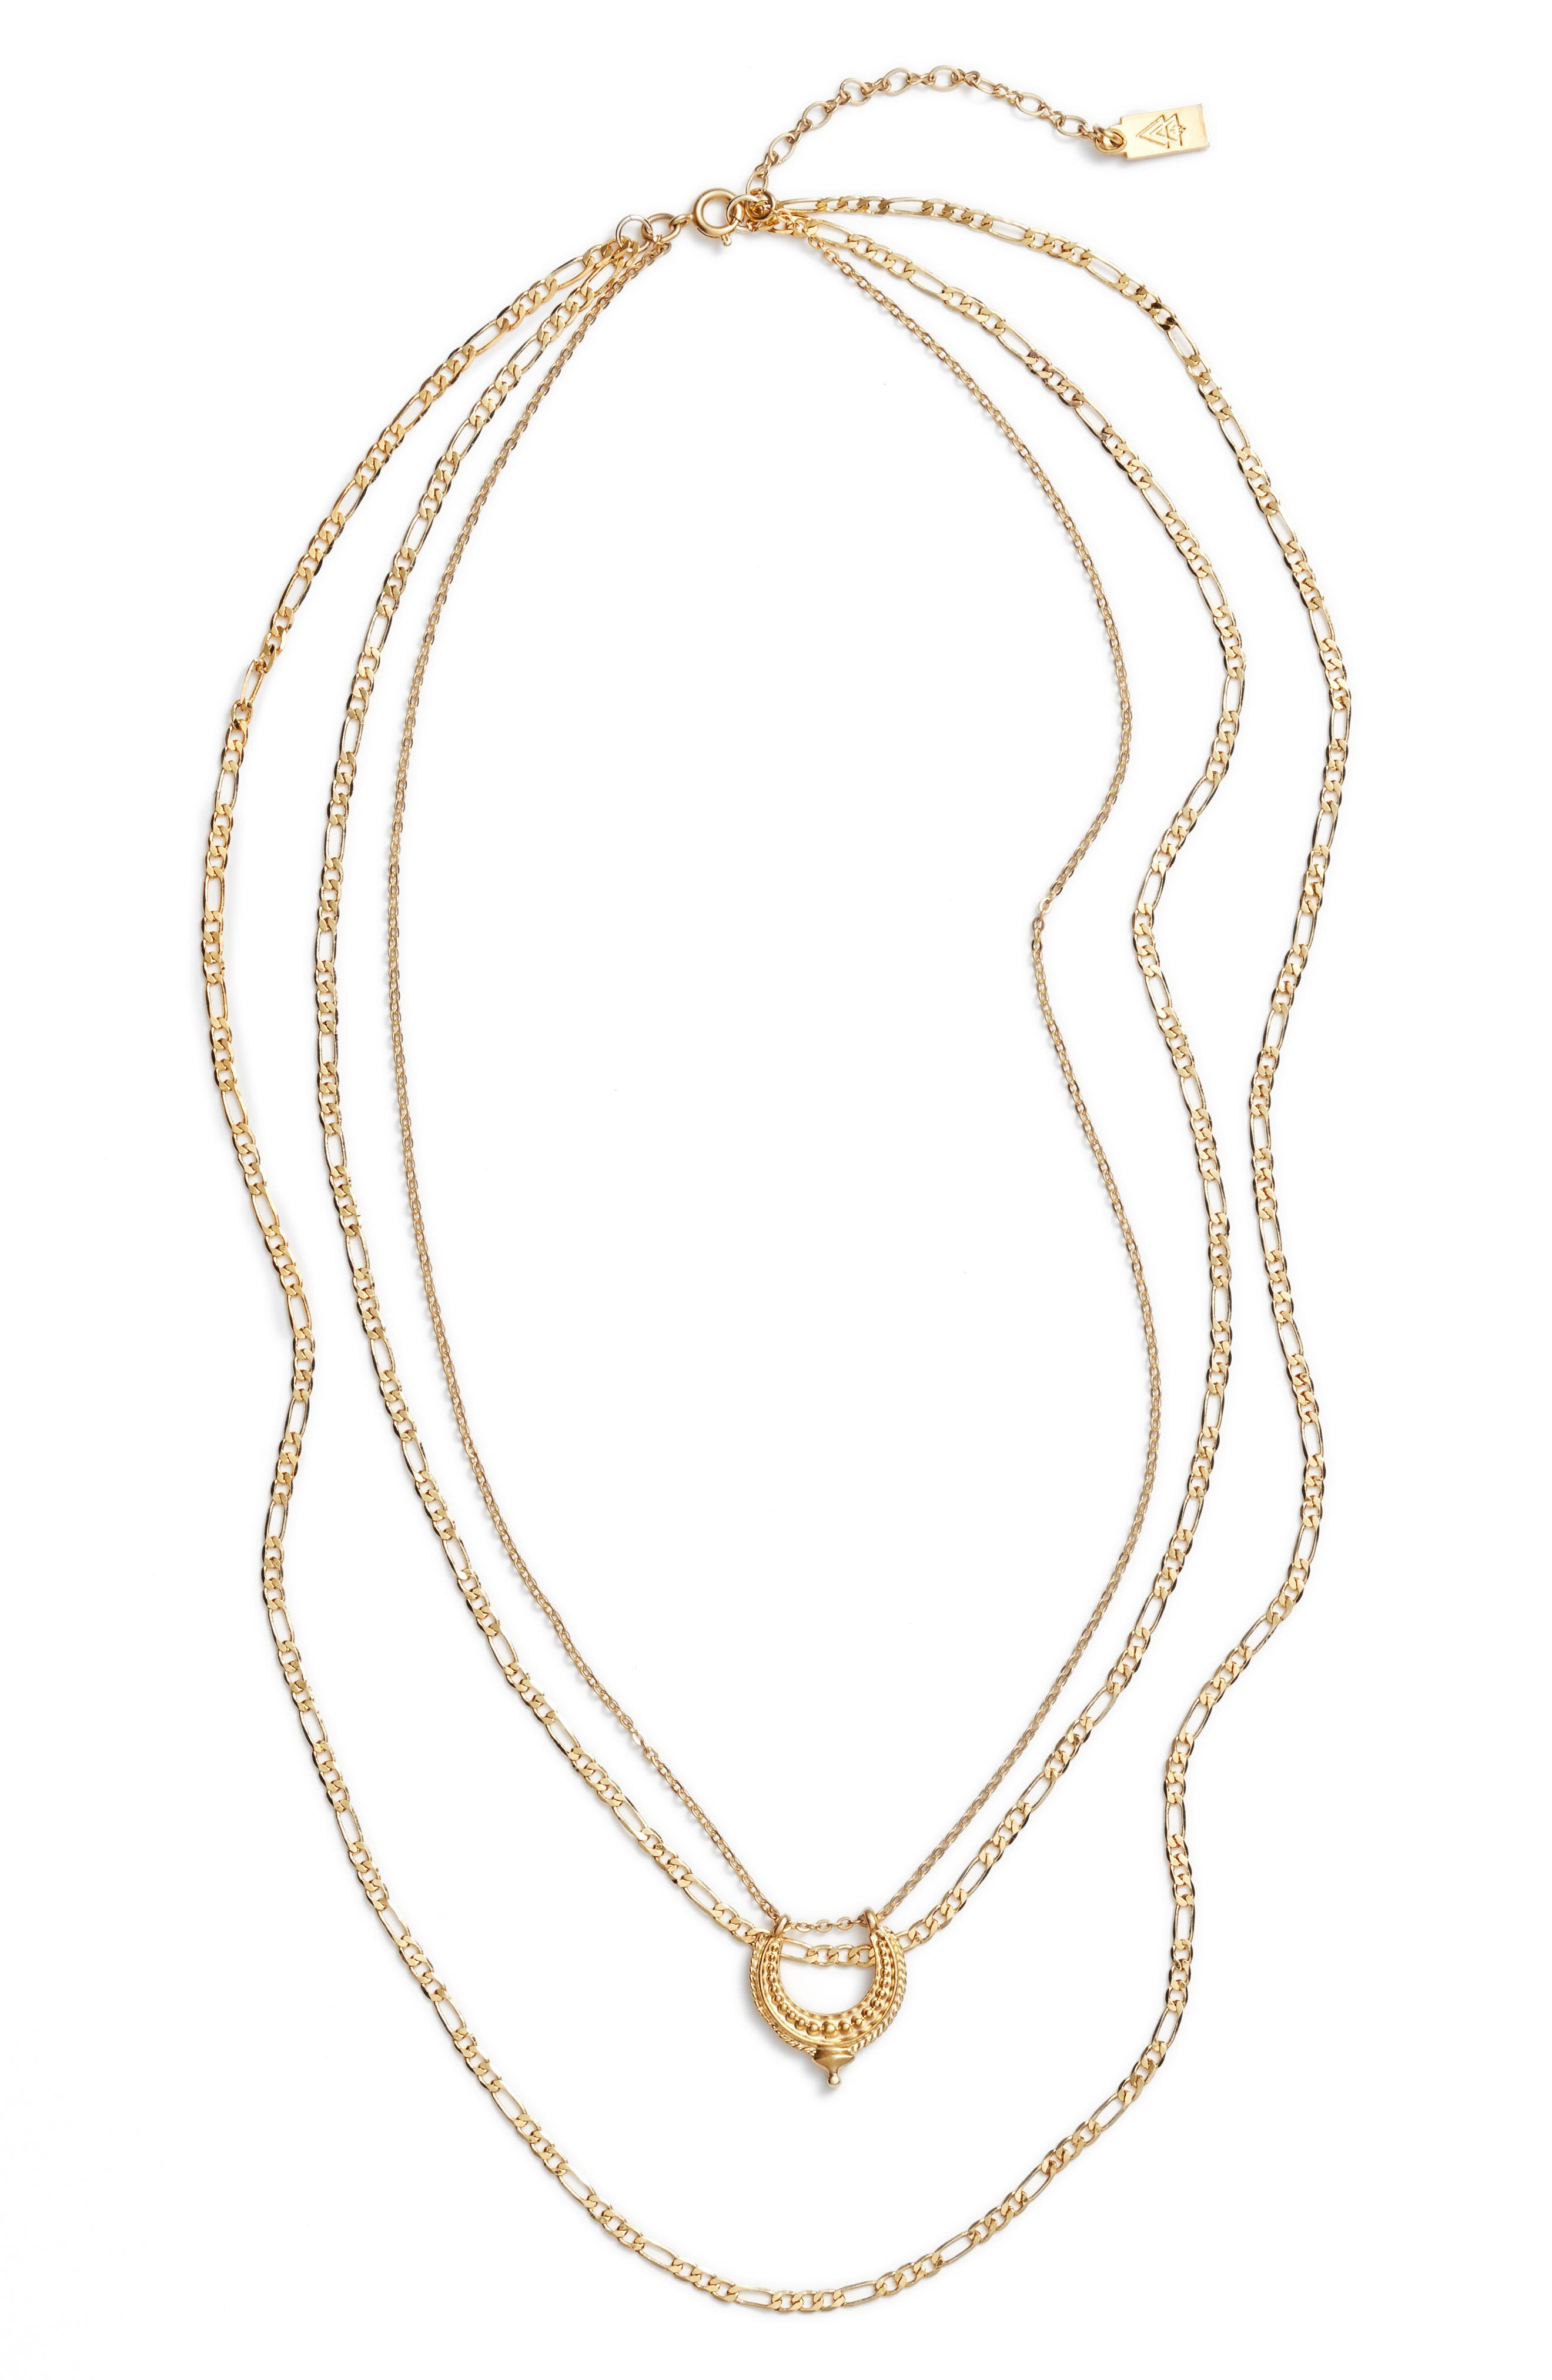 Ubud Layered Necklace,                             Main thumbnail 1, color,                             Gold